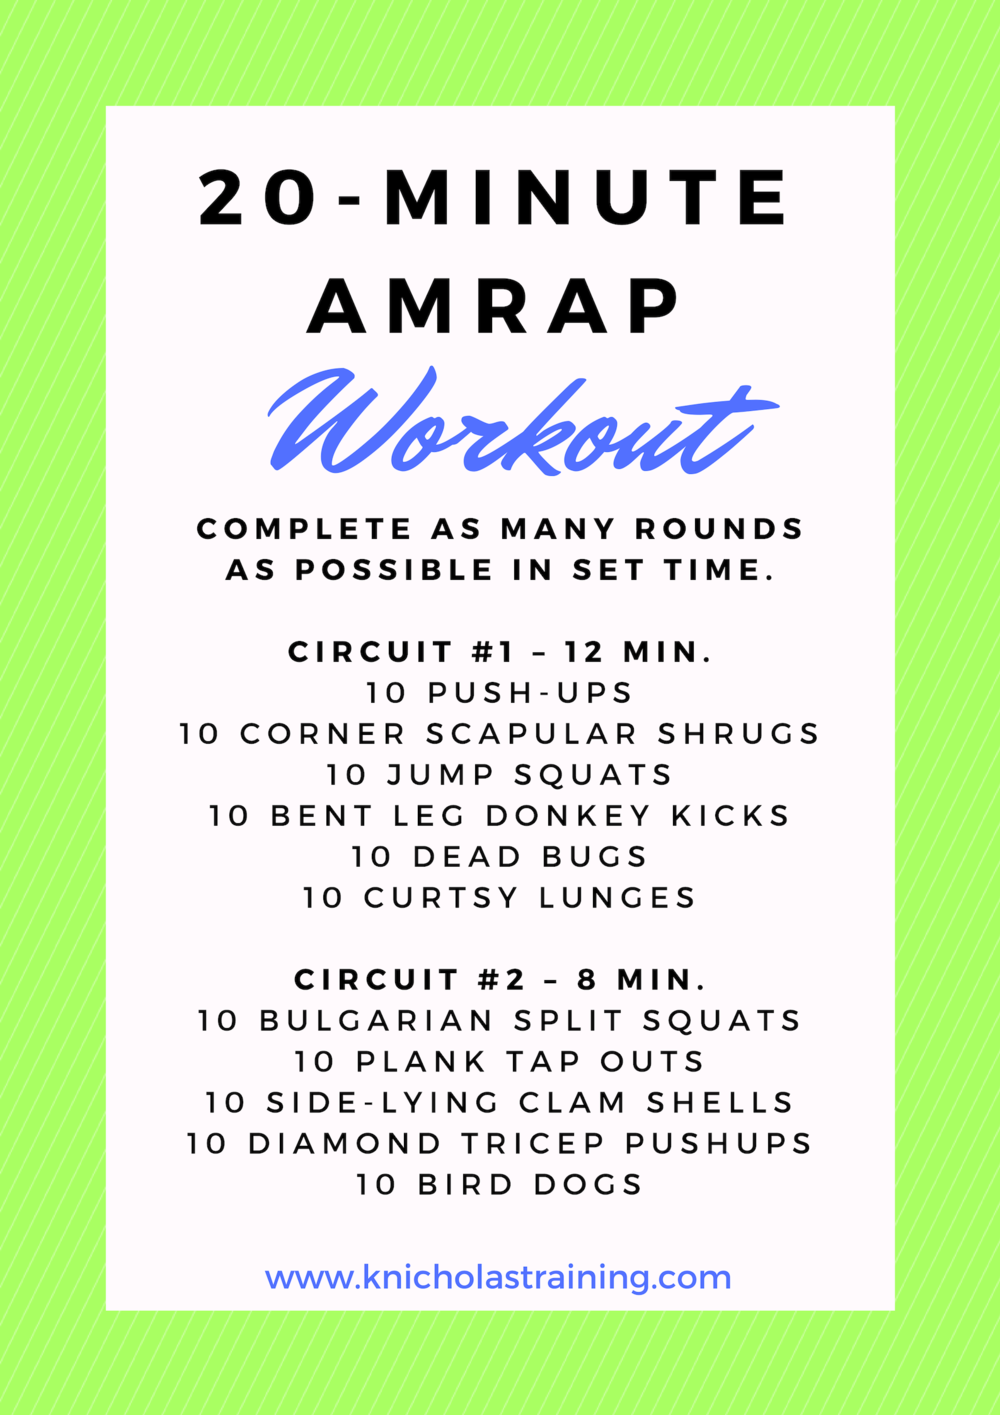 20-Minute AMRAP Workout.png